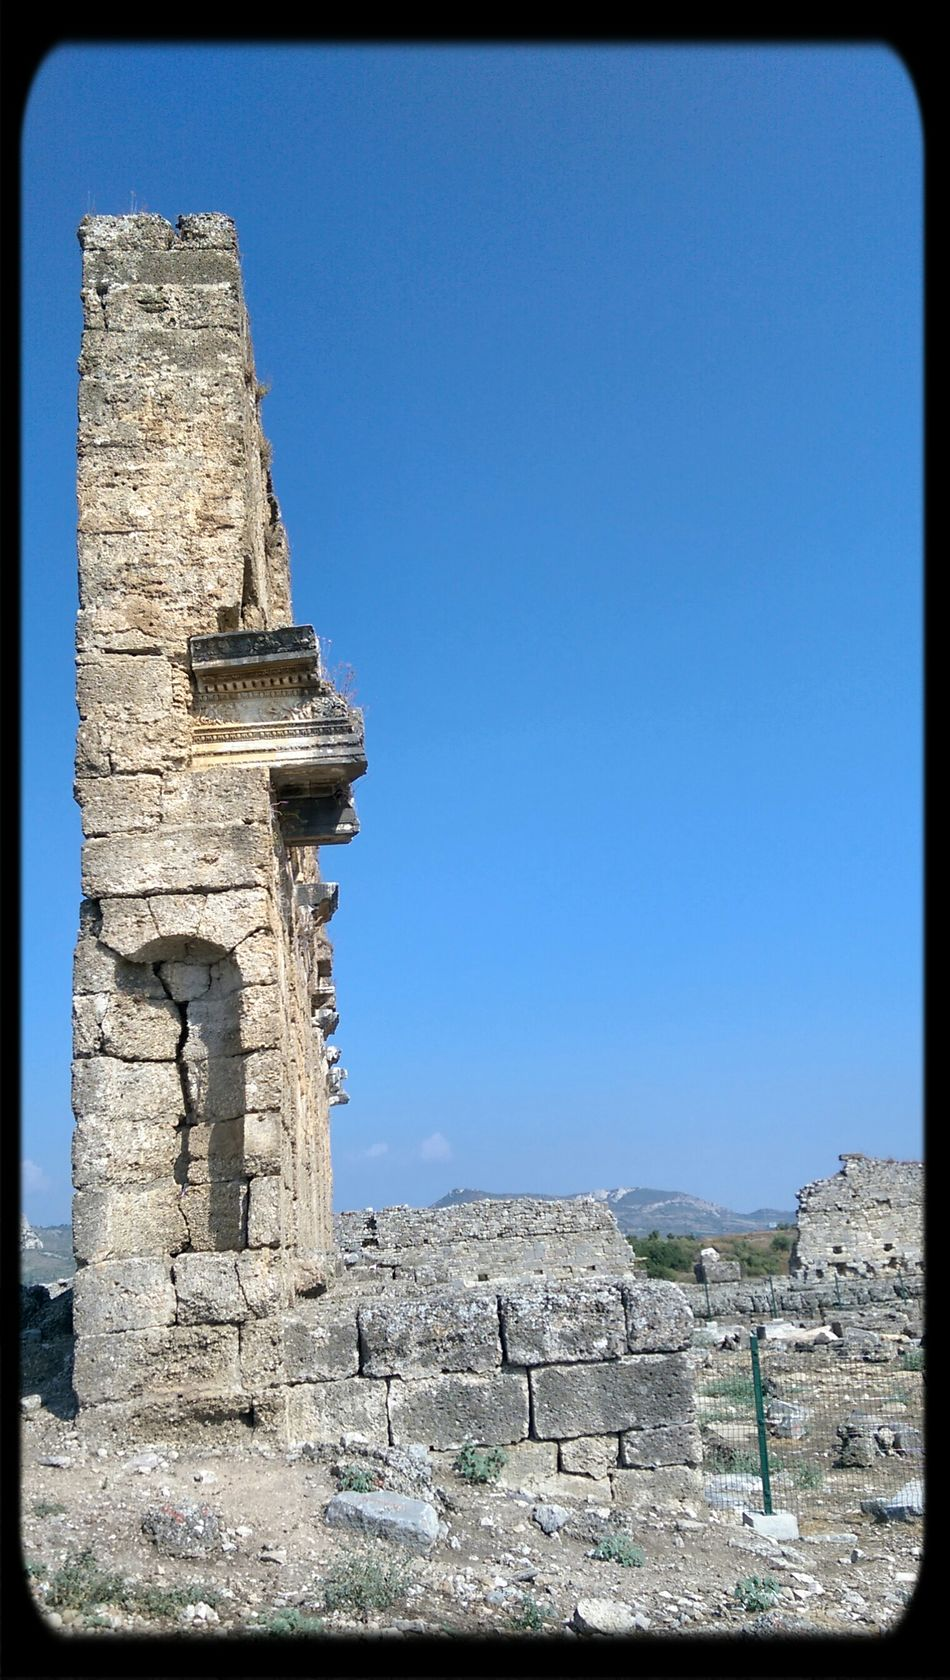 Aspendos  Serik Antik Kent Antik Theater